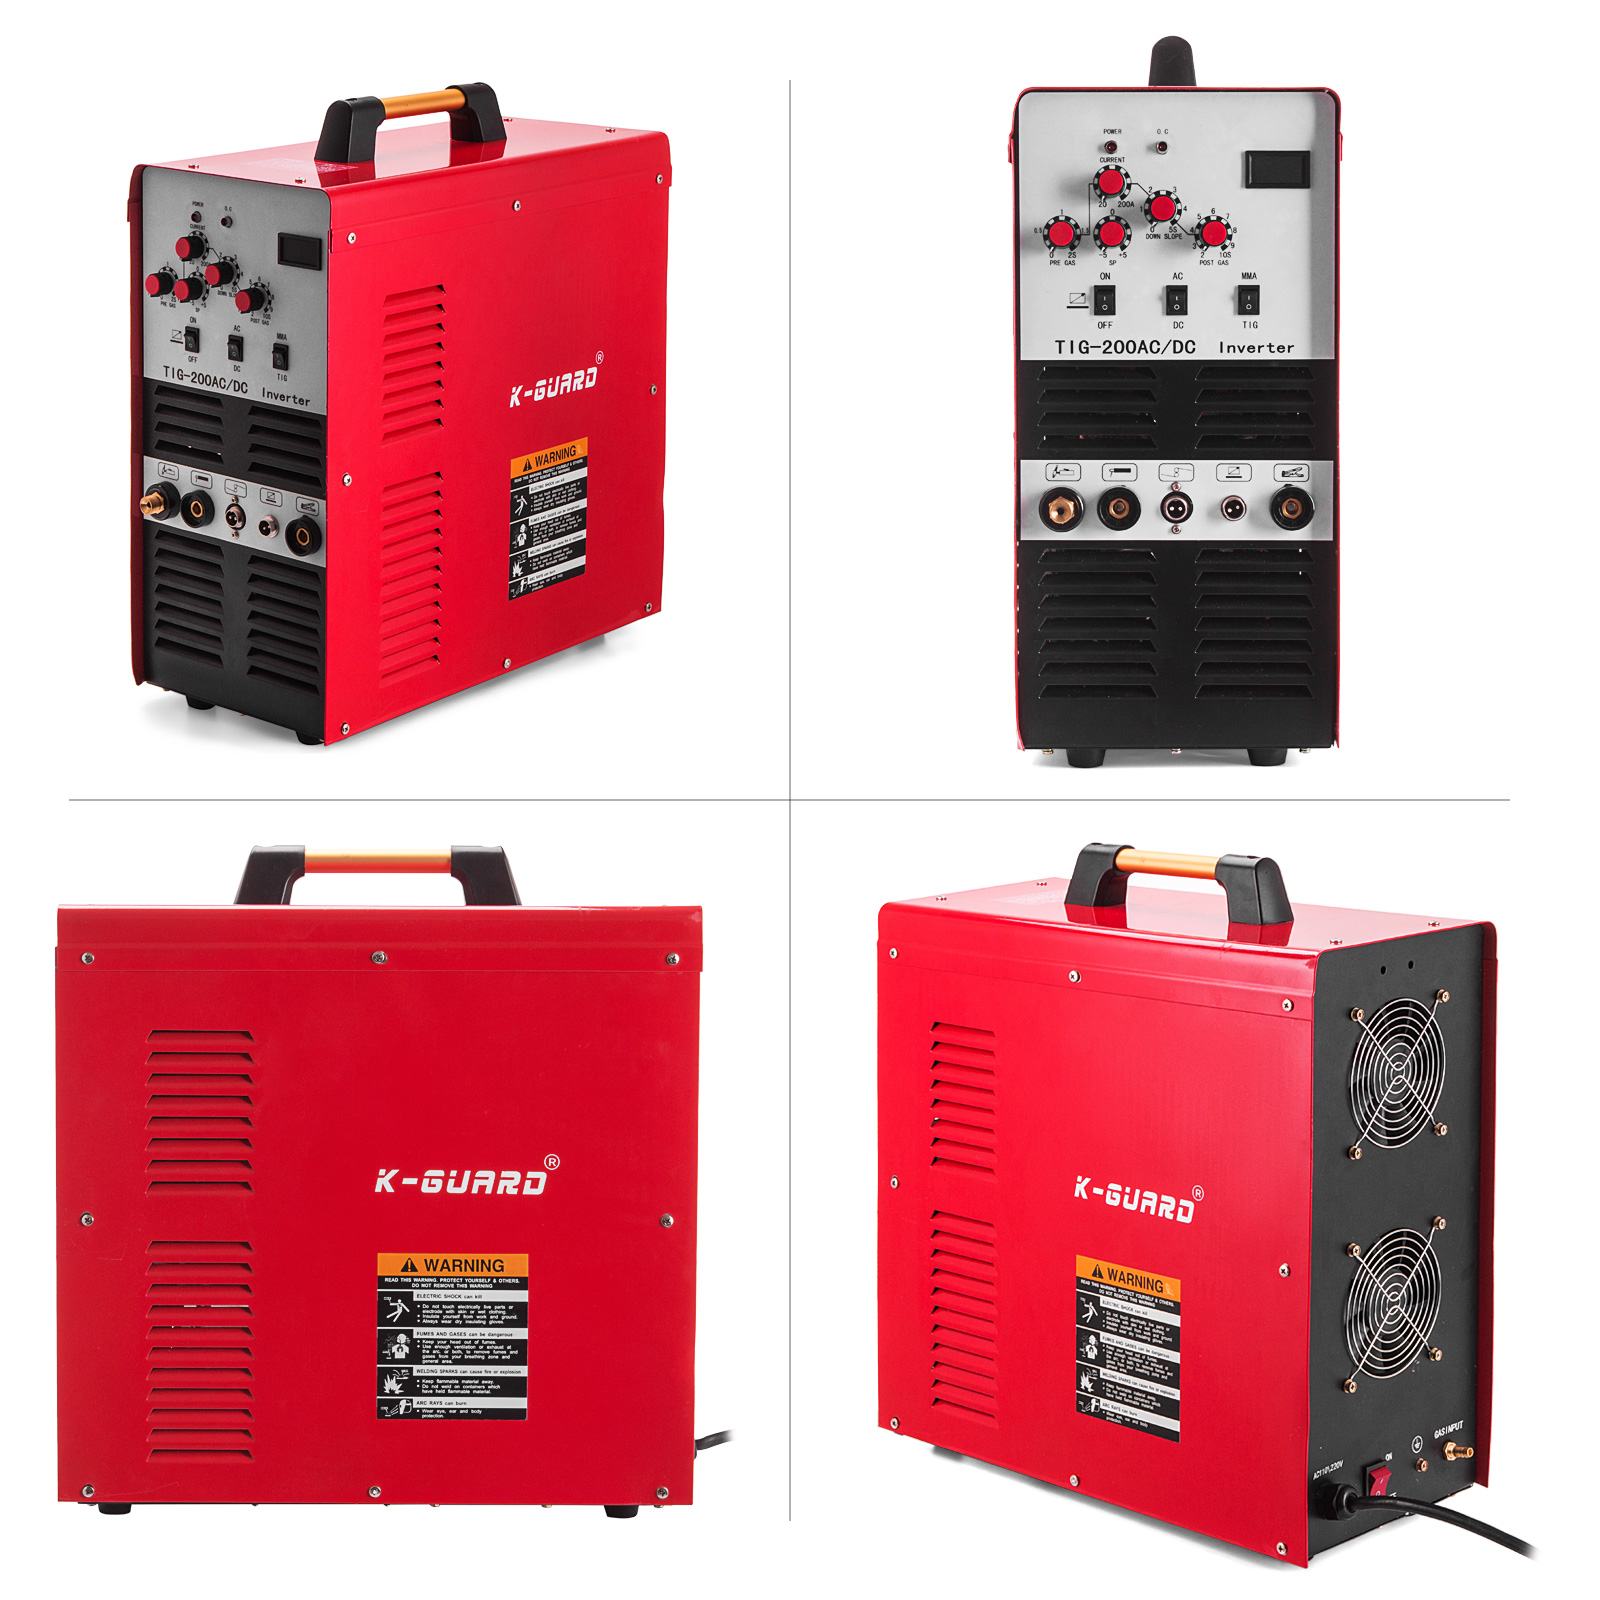 Inversor de Onda Máquina de Solda de Alta Vara Quadrada dc Alumínio 200 Ampères Soldador Igbt Pulso Qualidade Metal110 220 v Tig – ac